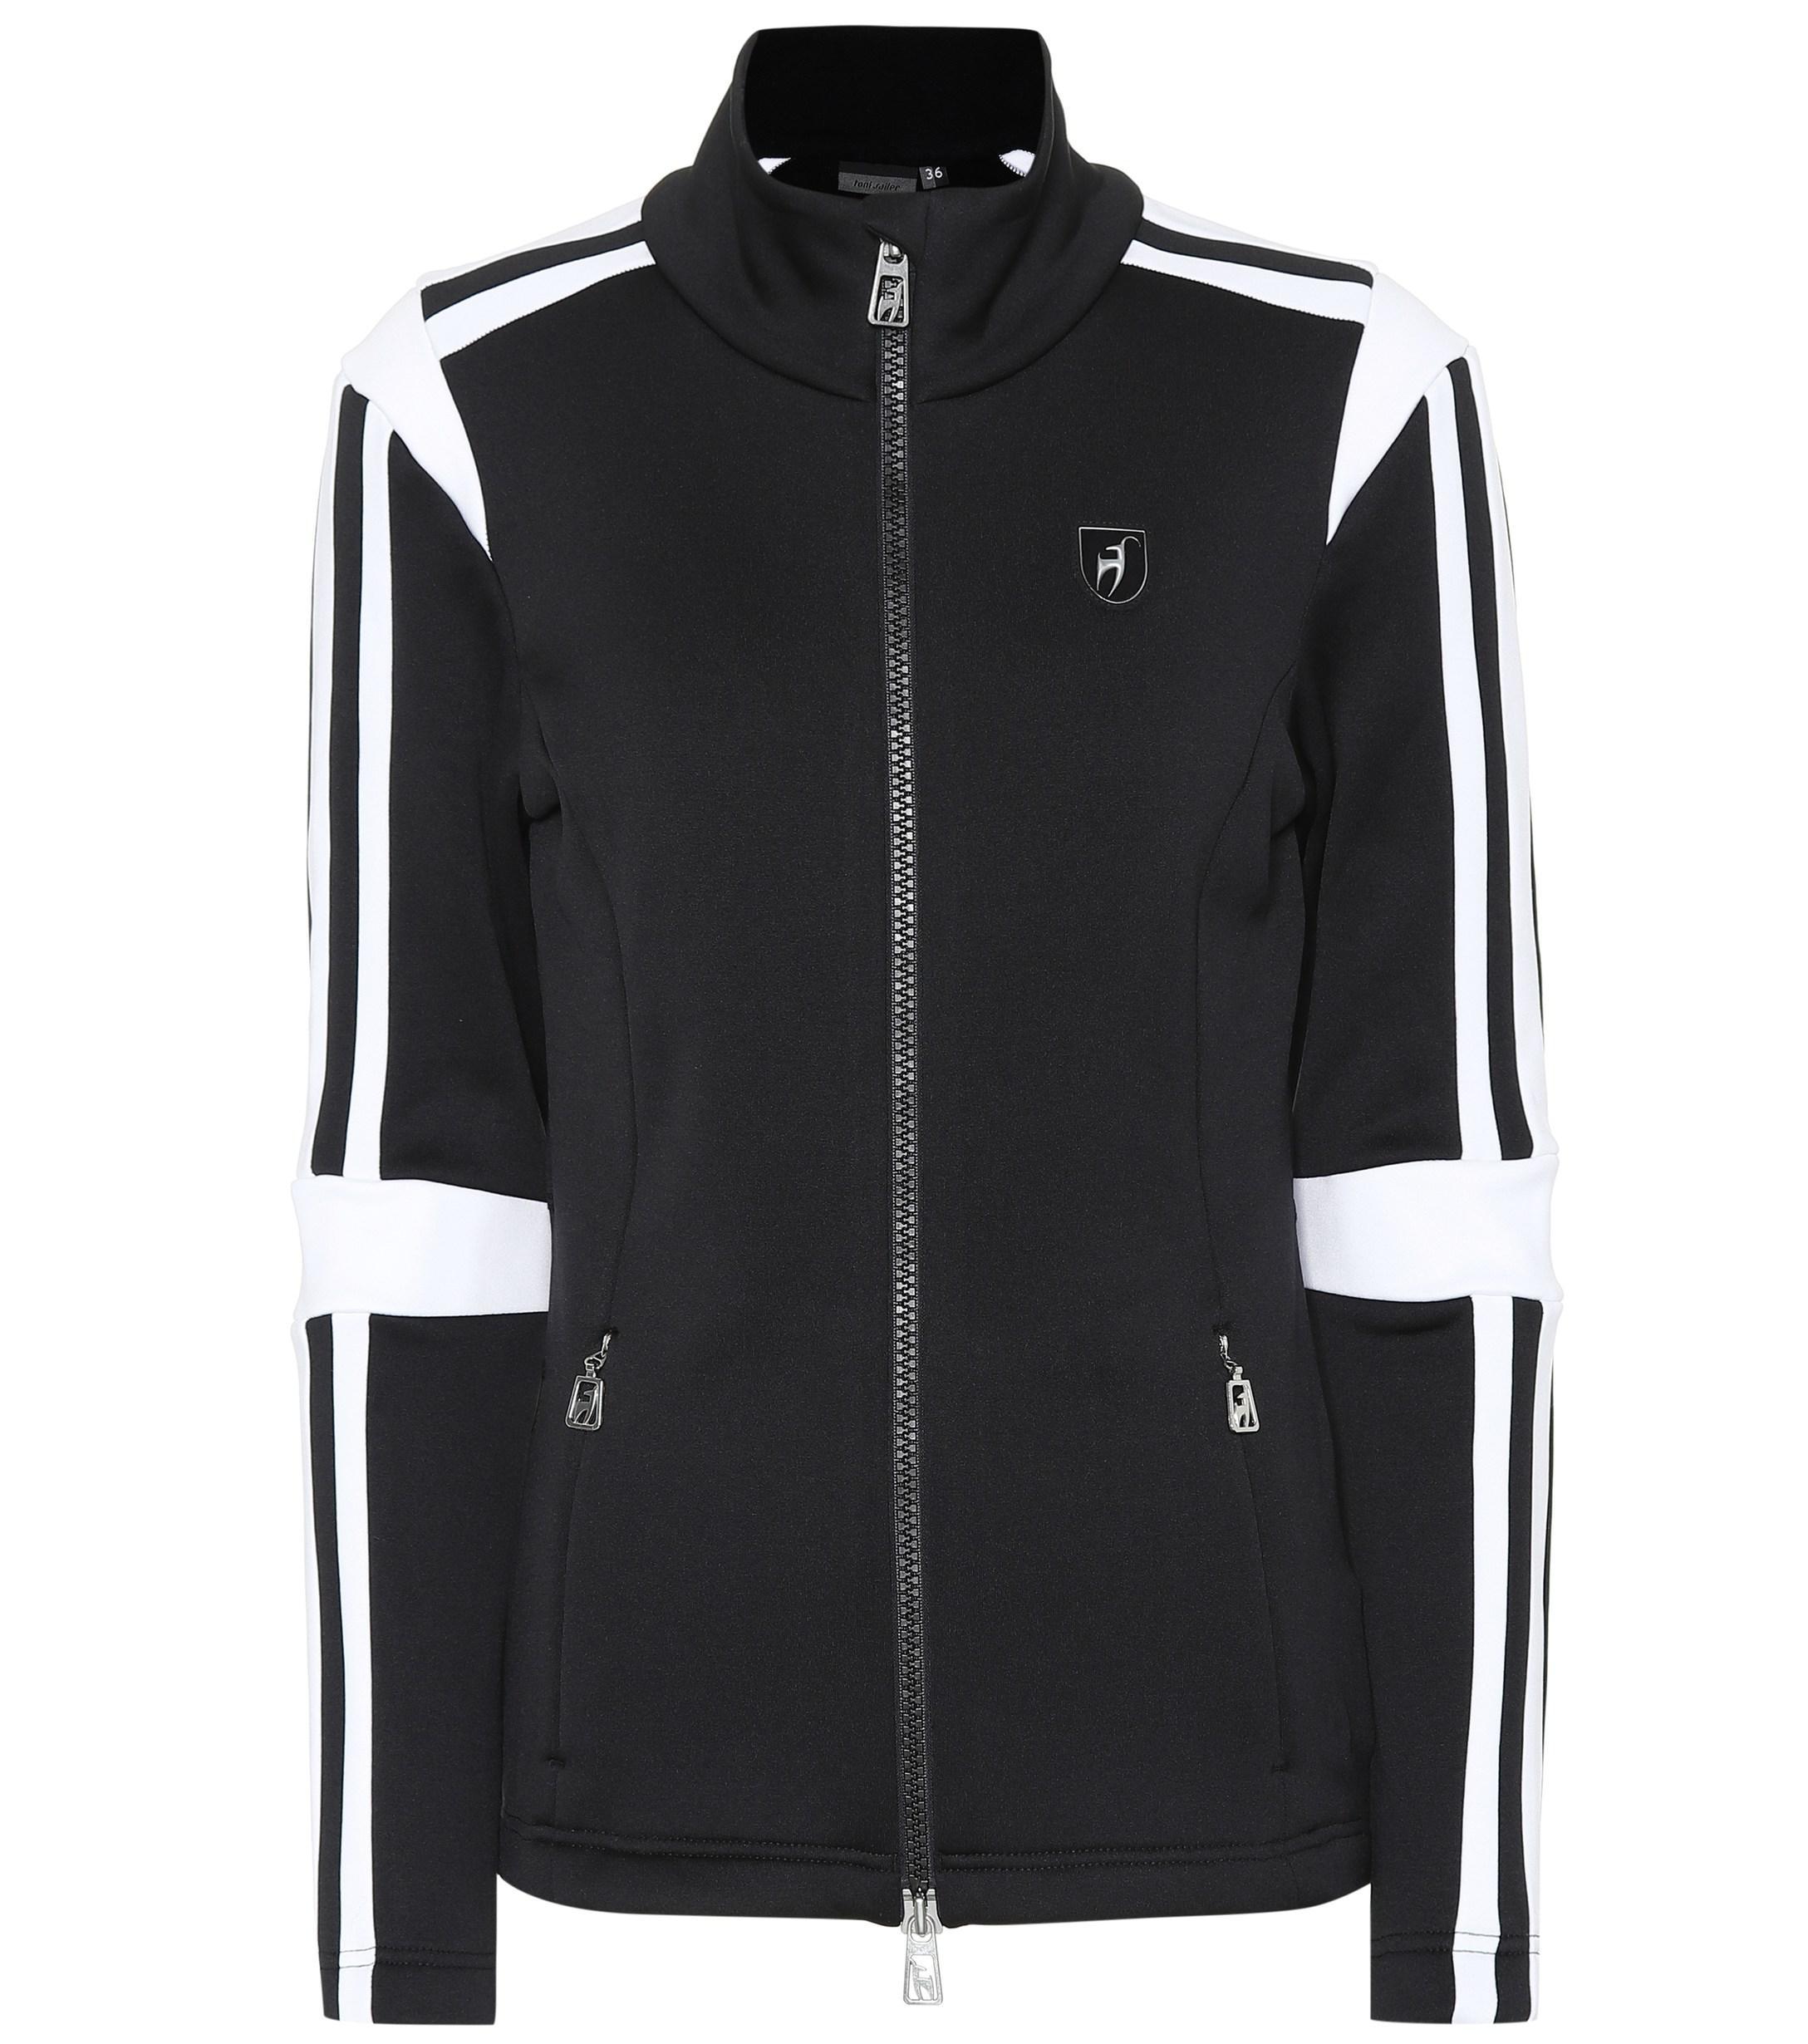 057b23dab15 Toni Sailer Felice Fleece Jacket in Black - Lyst